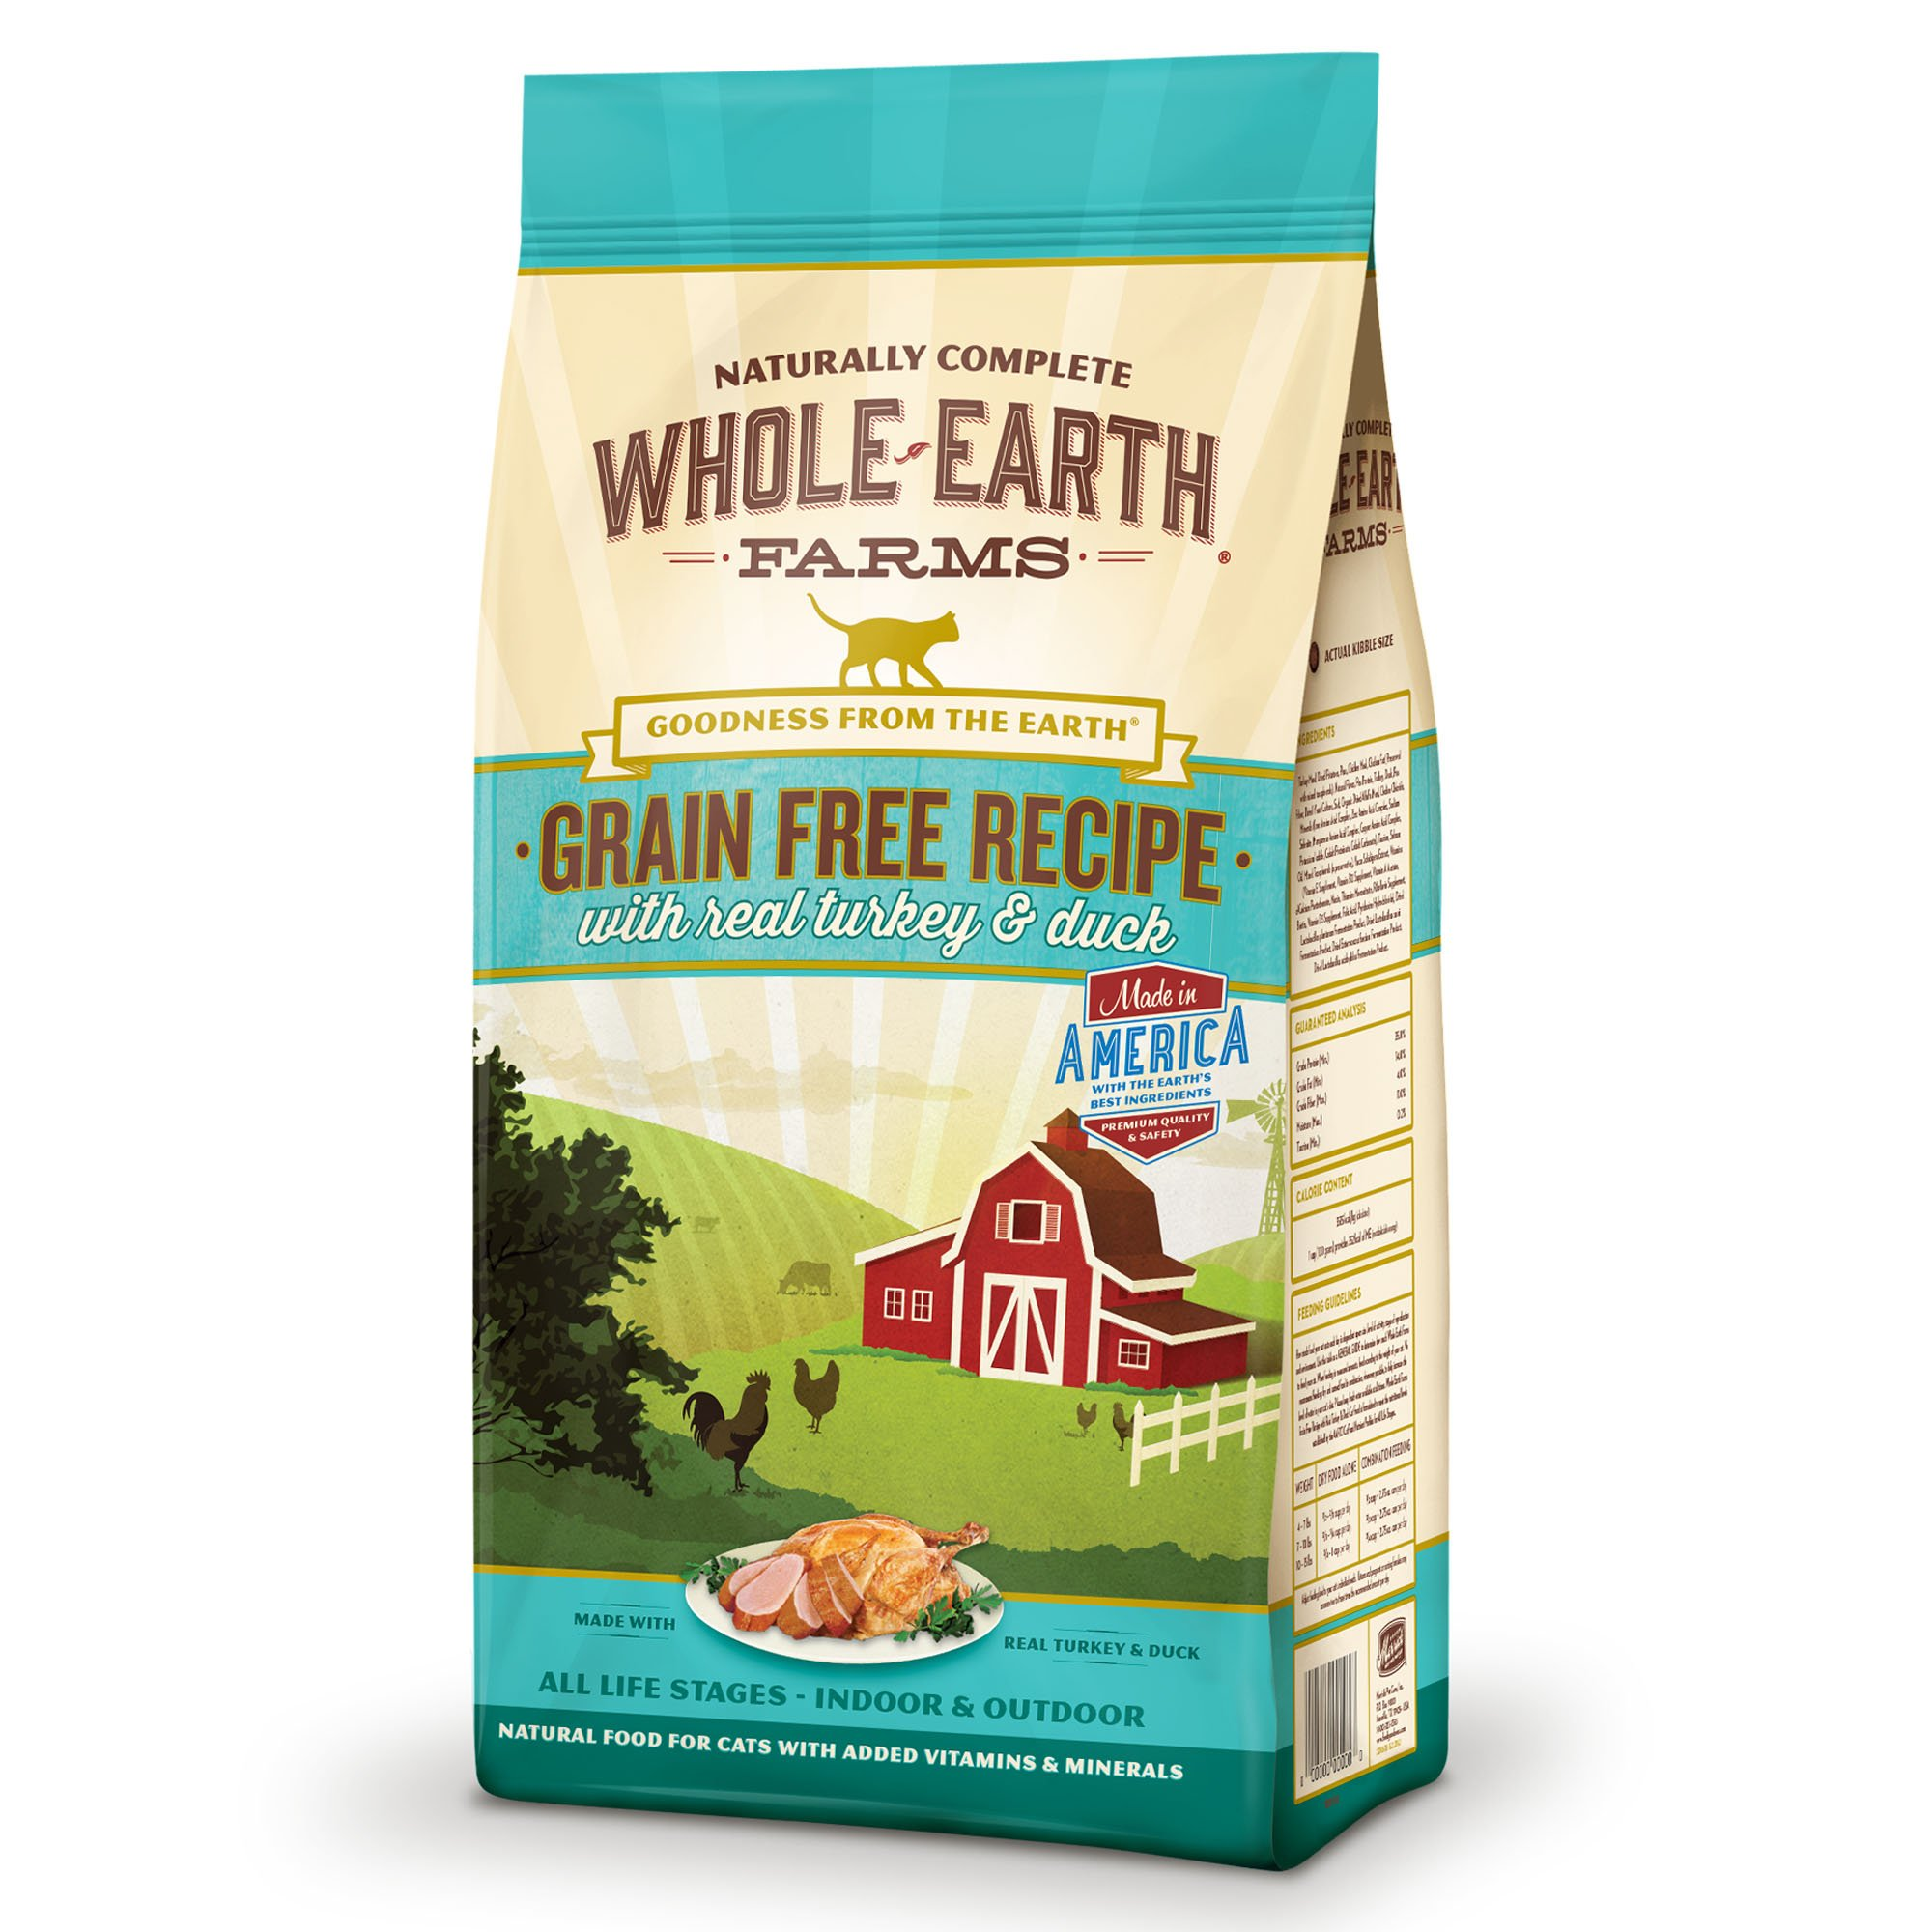 Whole-Earth-Farms-Grain-Free-Real-Turkey-amp-Duck-Cat-Food thumbnail 15